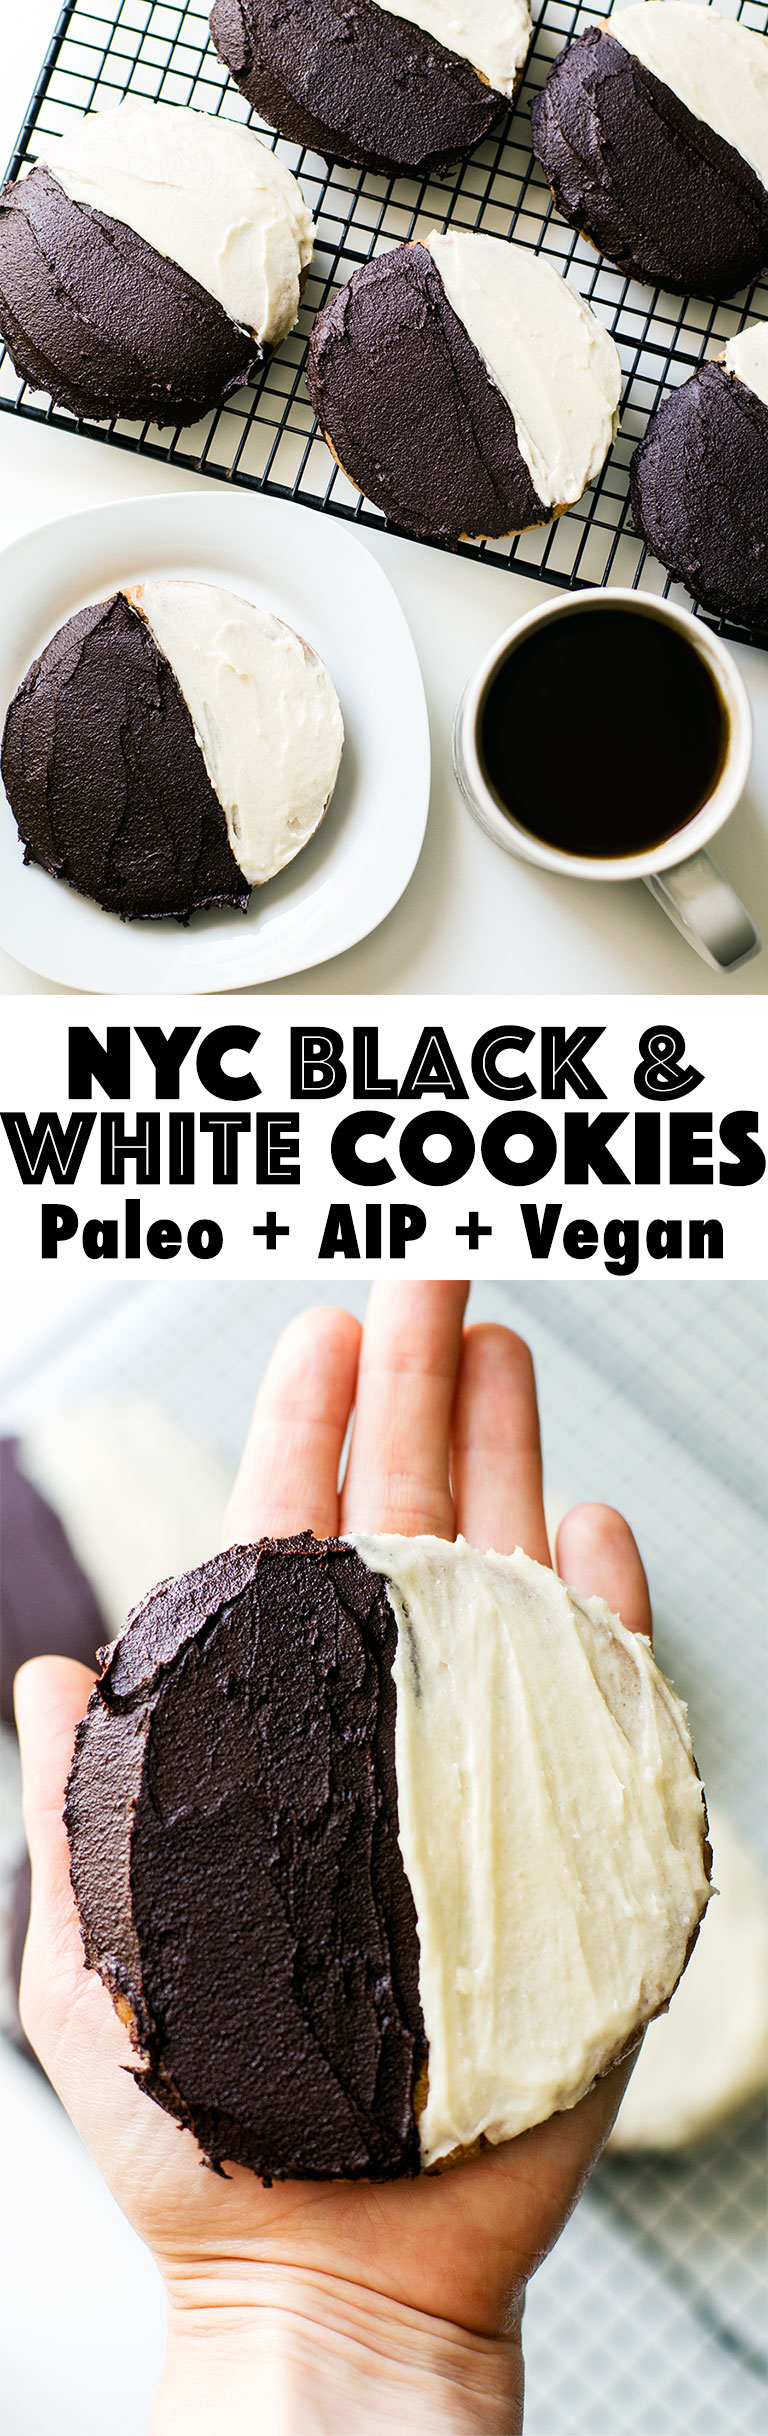 Paleo NYC black and white cookies